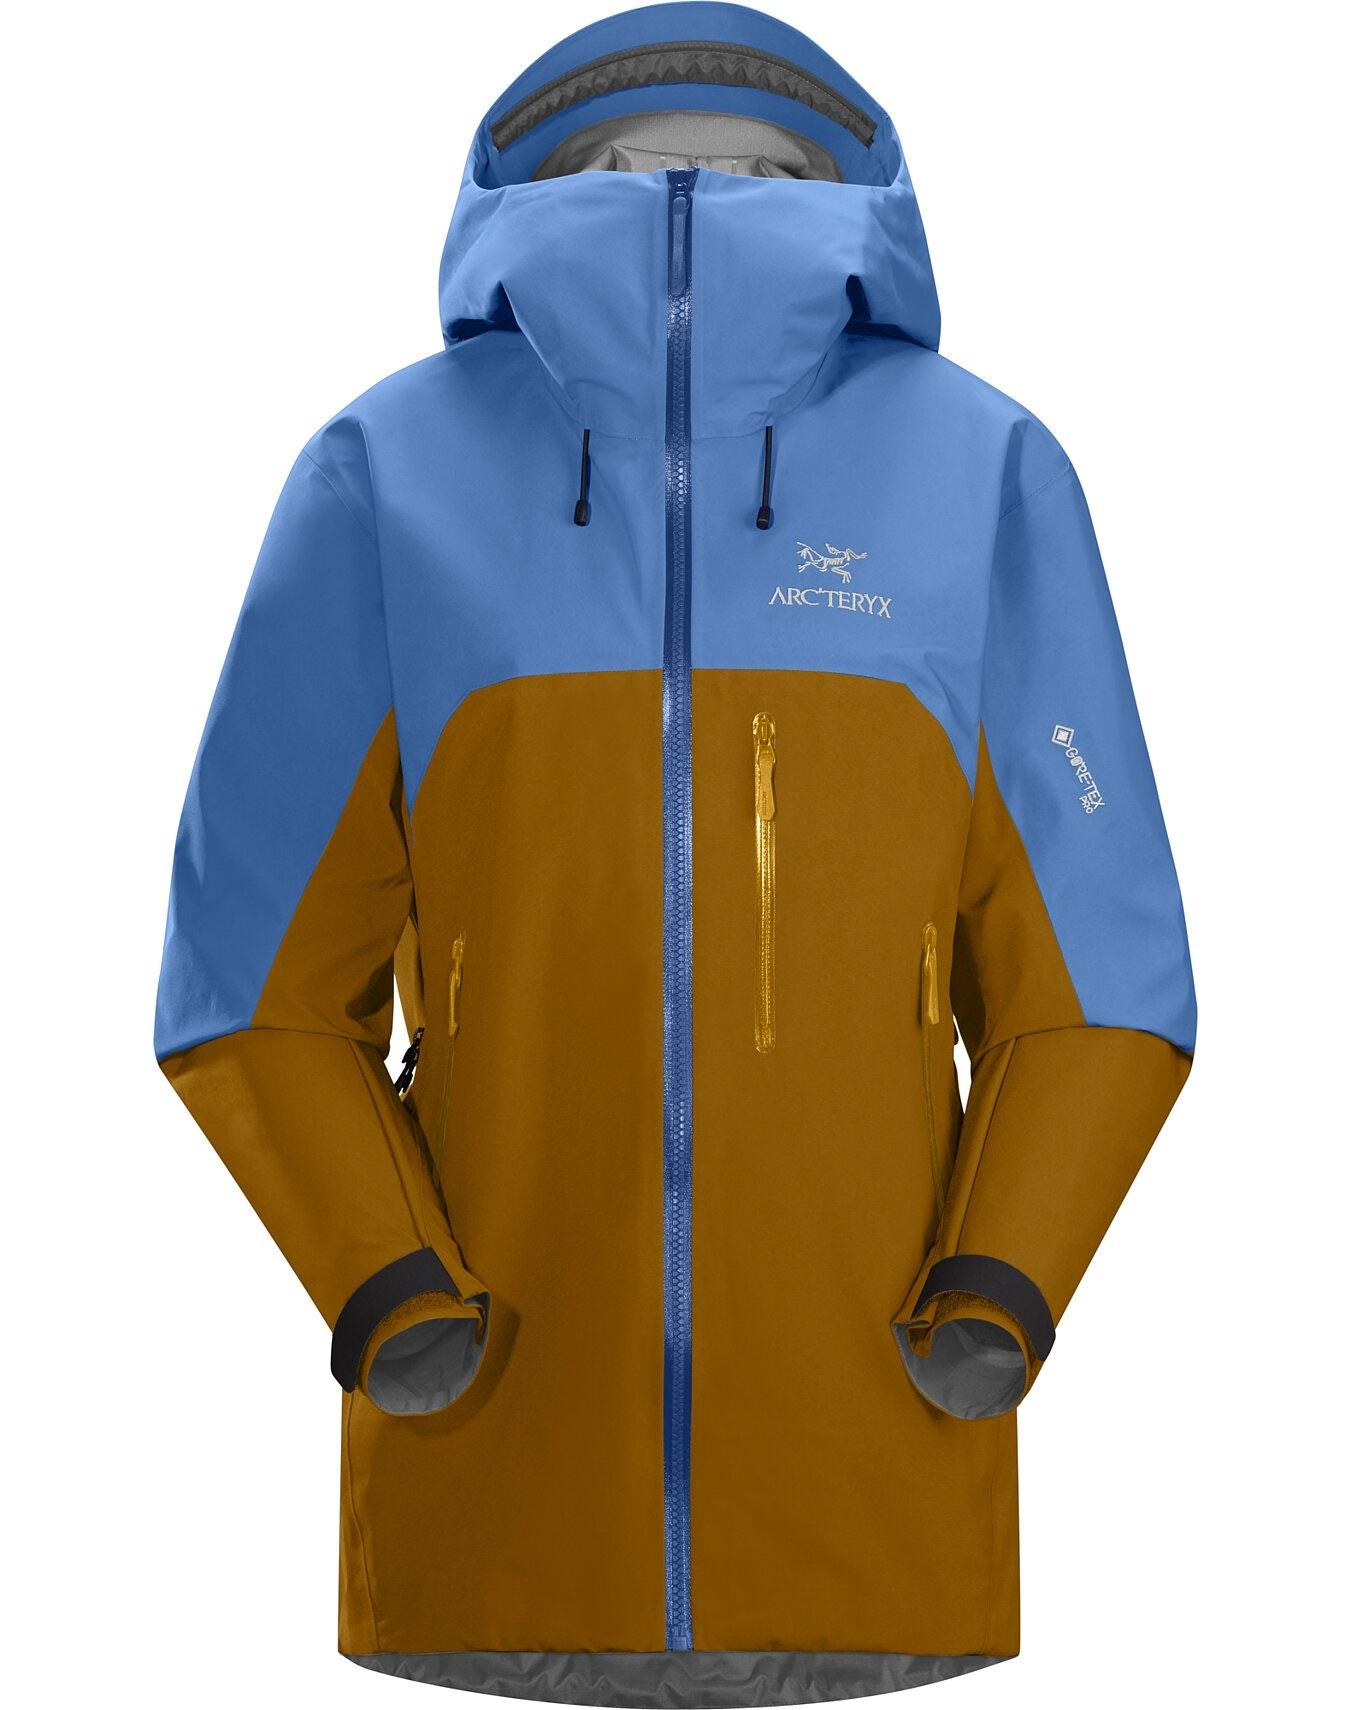 Beta SV Jacket ReBird Sundance/Helix